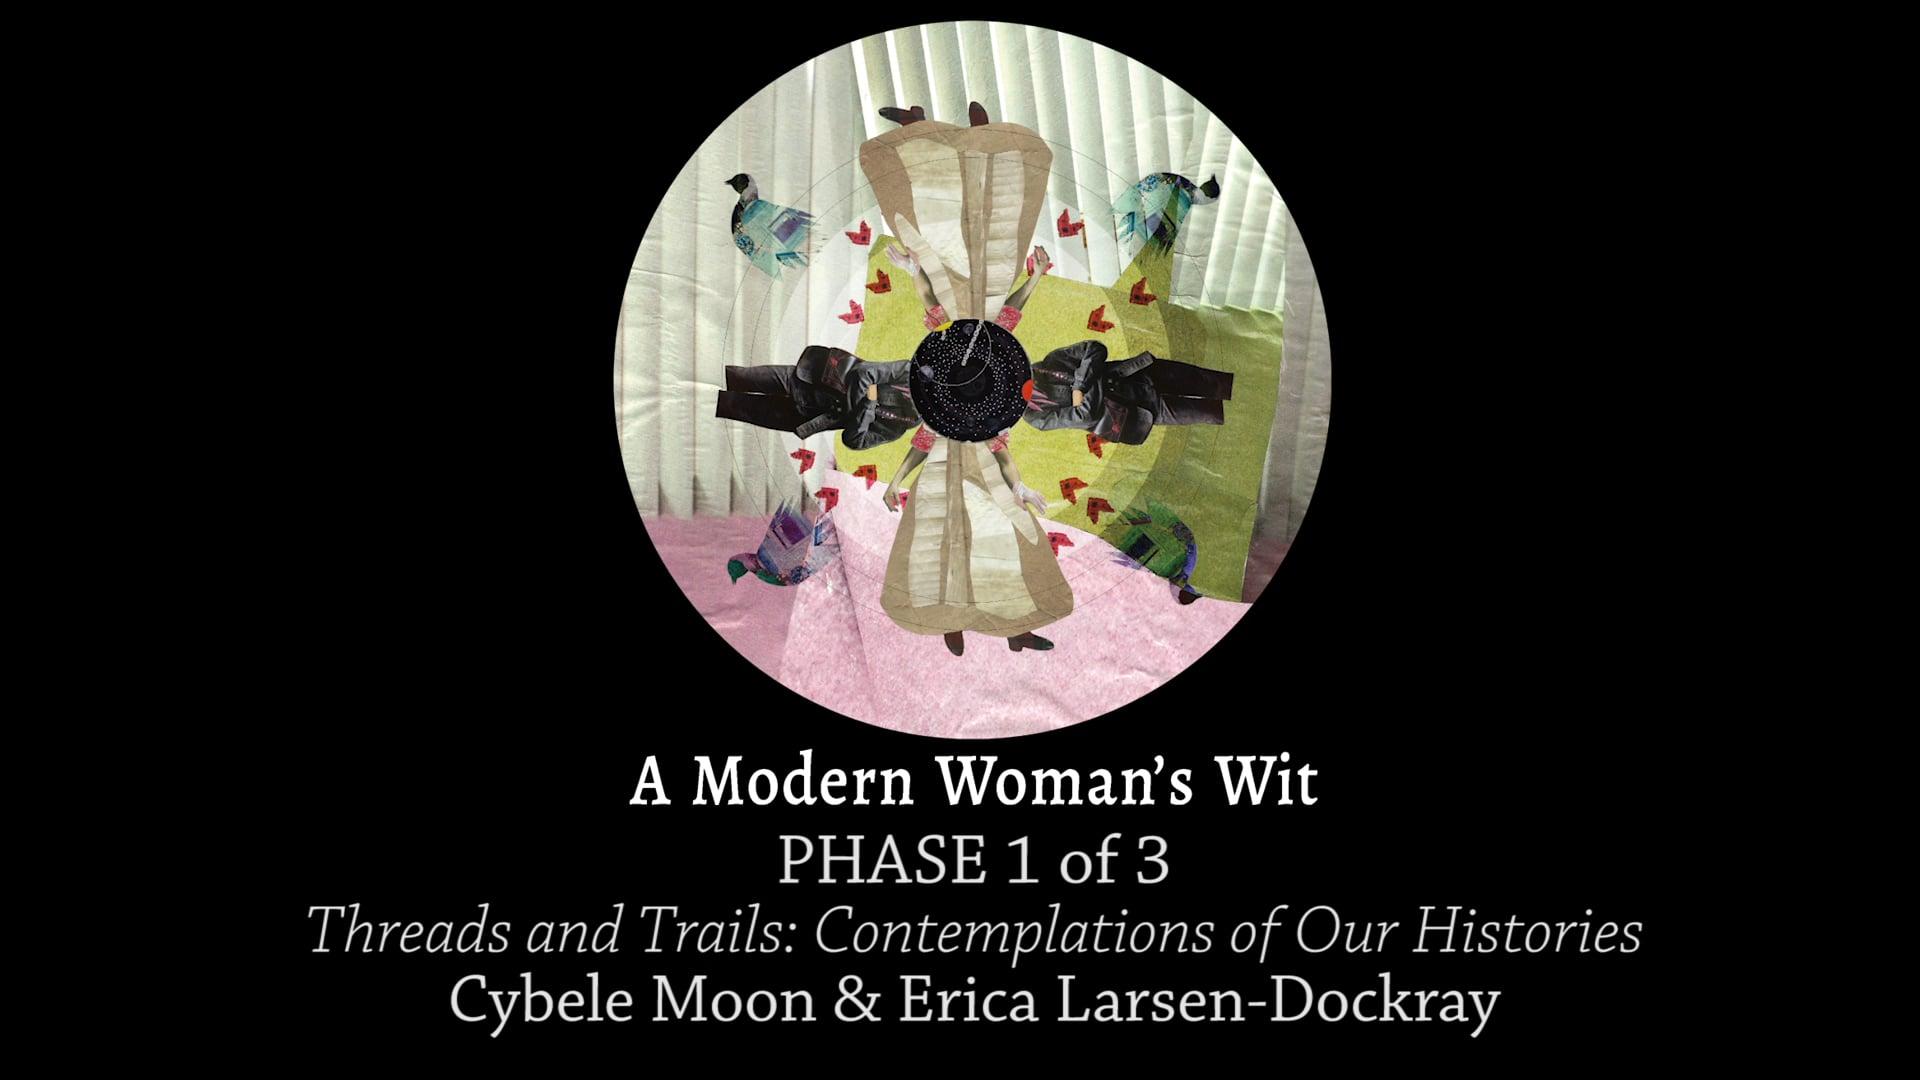 A Modern Woman's Wit Documentation from Wesleyan University